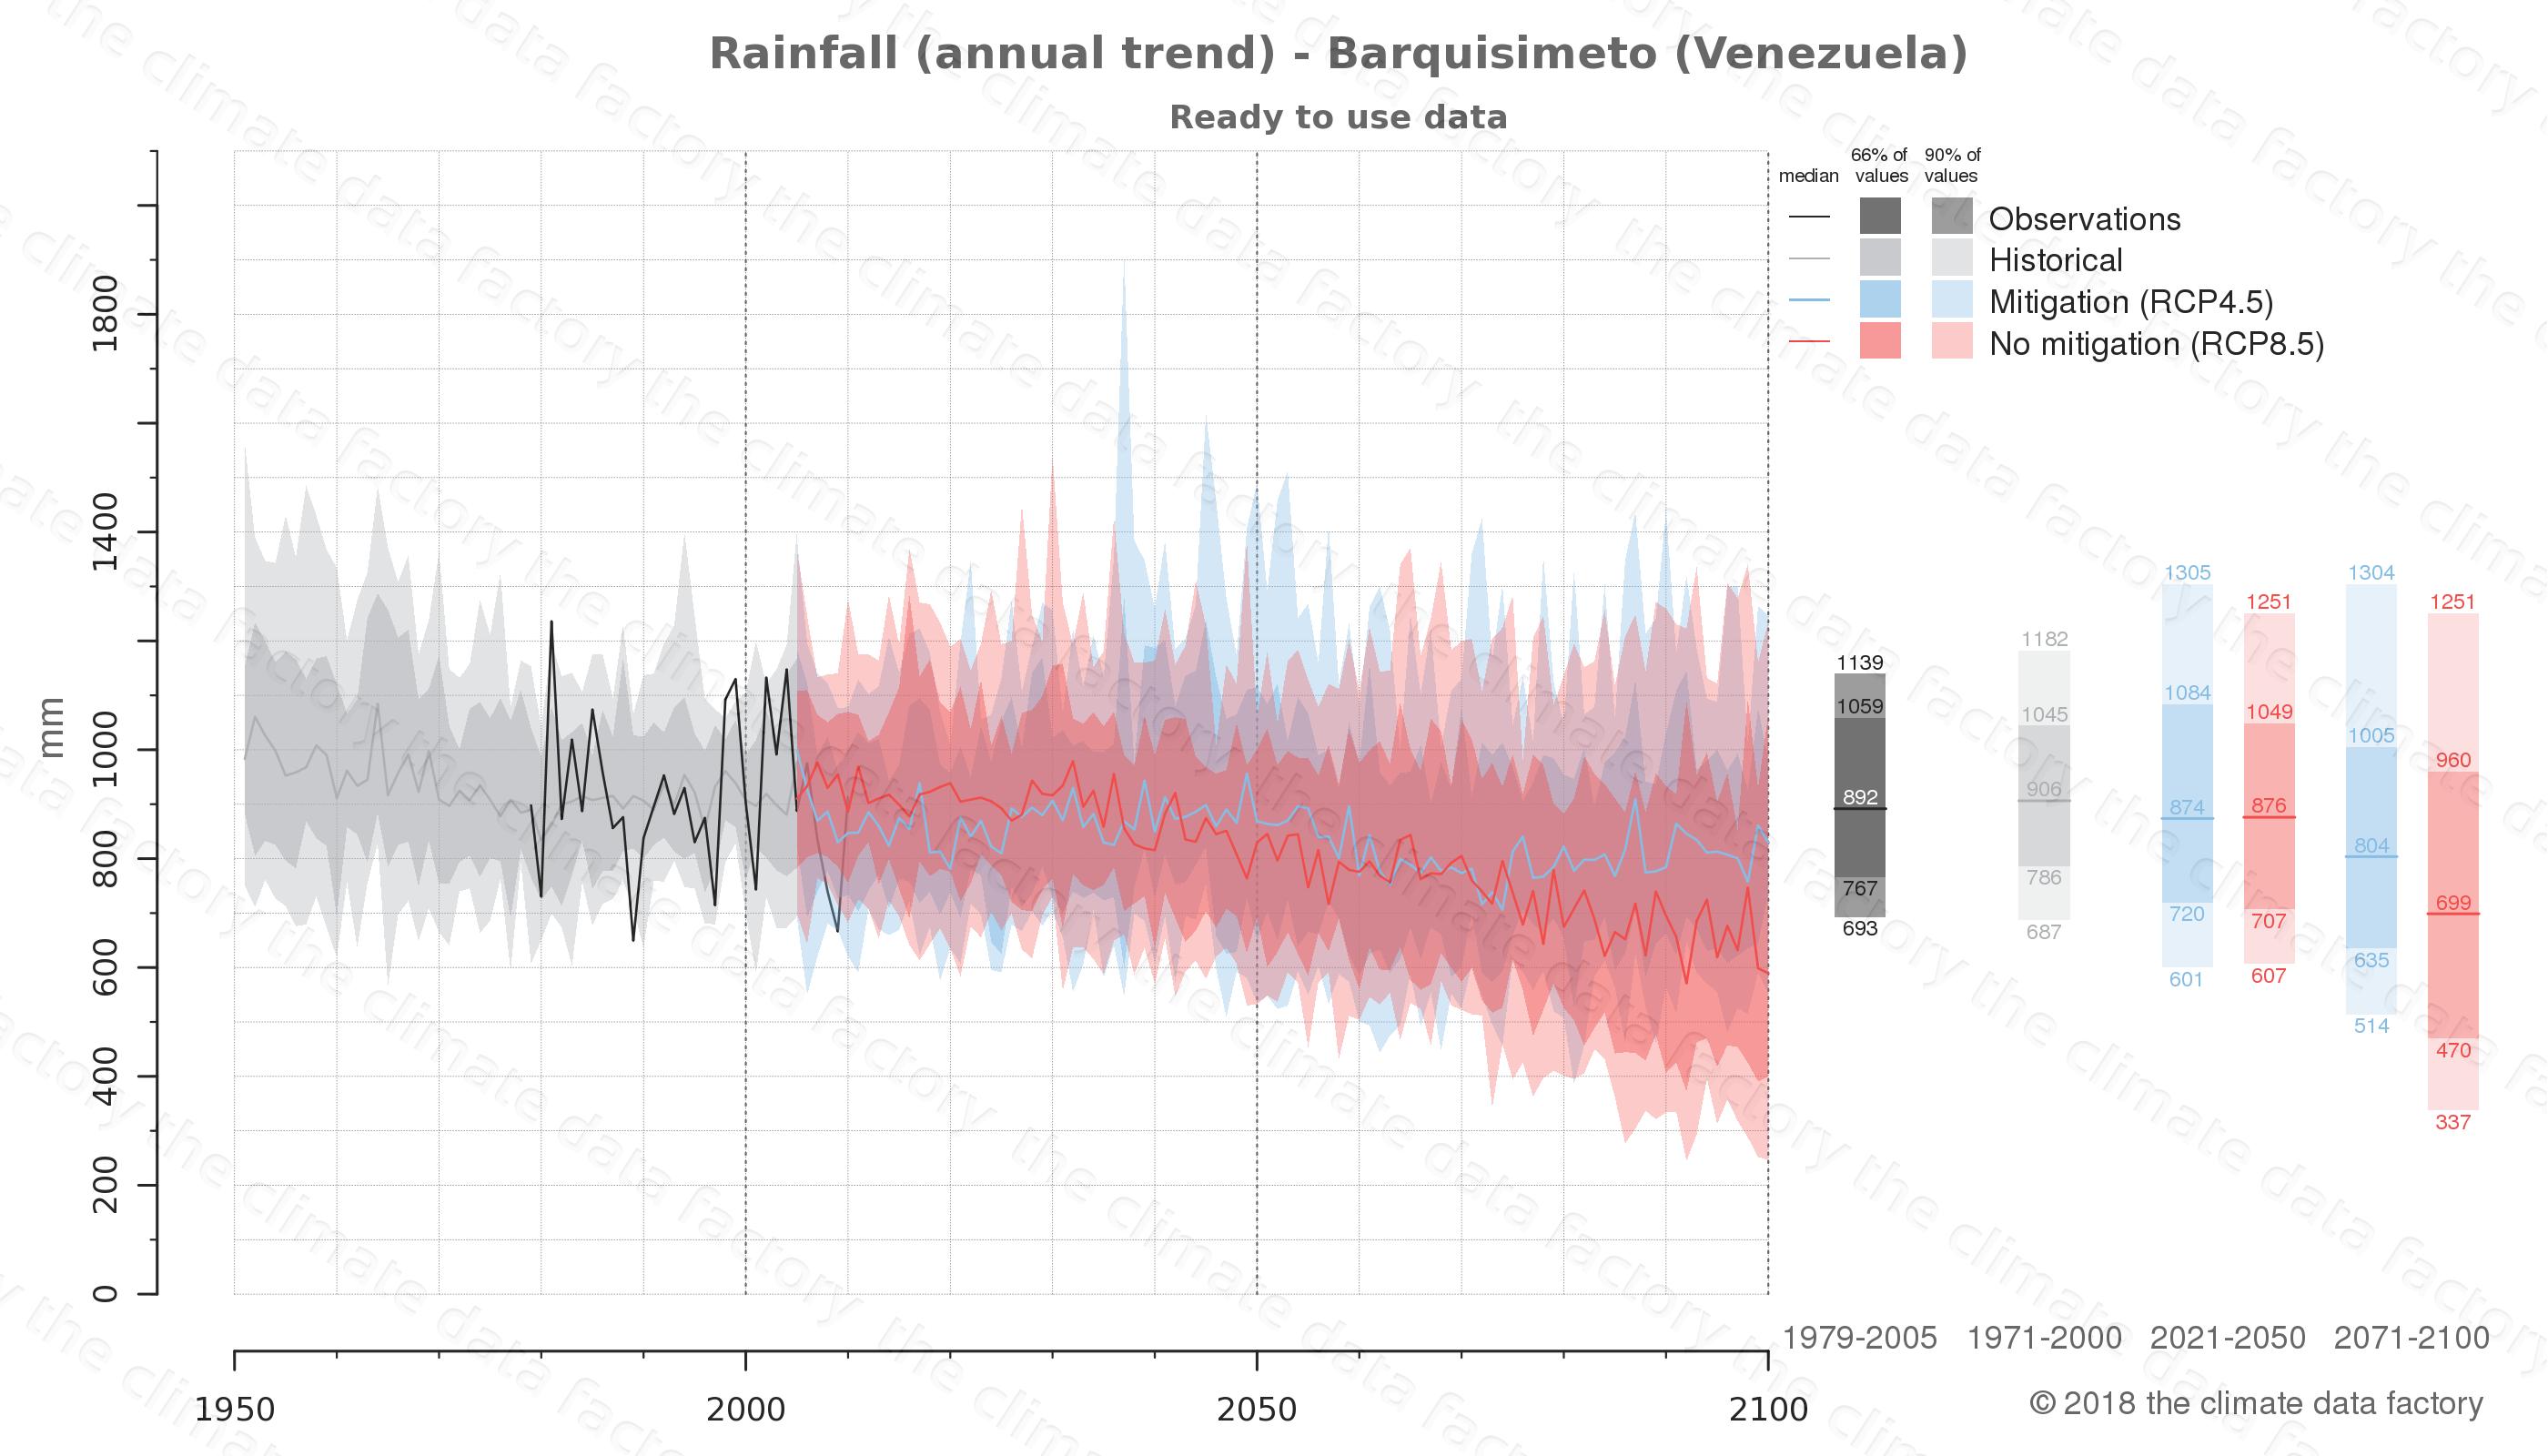 climate change data policy adaptation climate graph city data rainfall barquisimeto venezuela